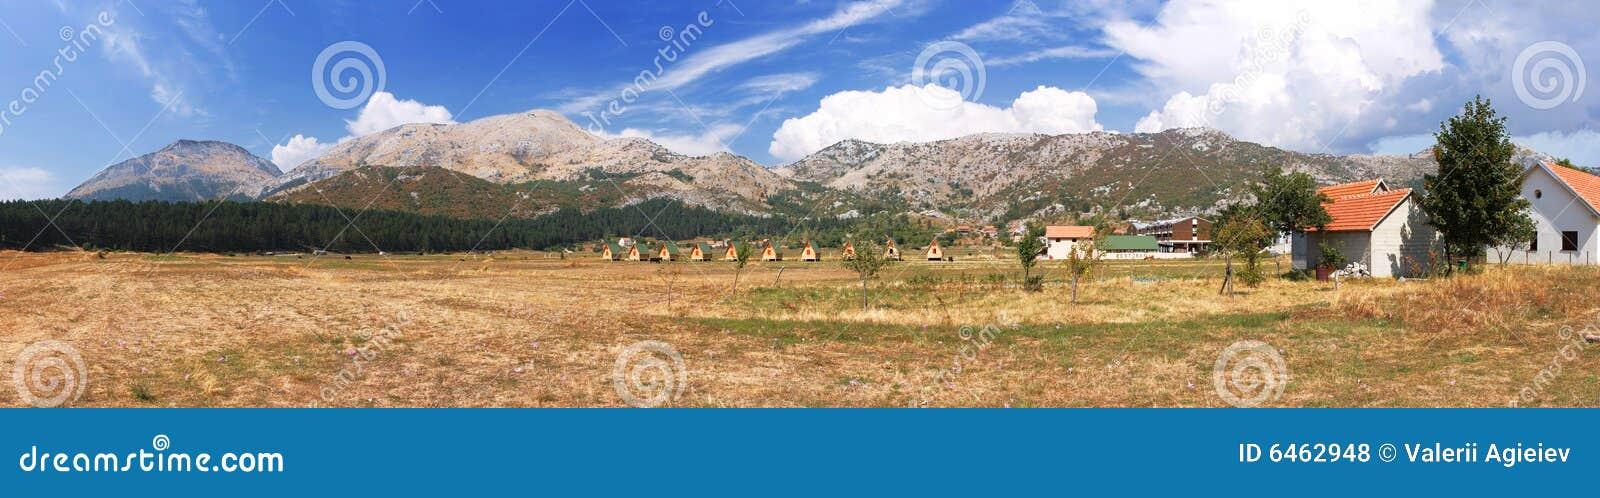 Czarnogóra balkans wioski